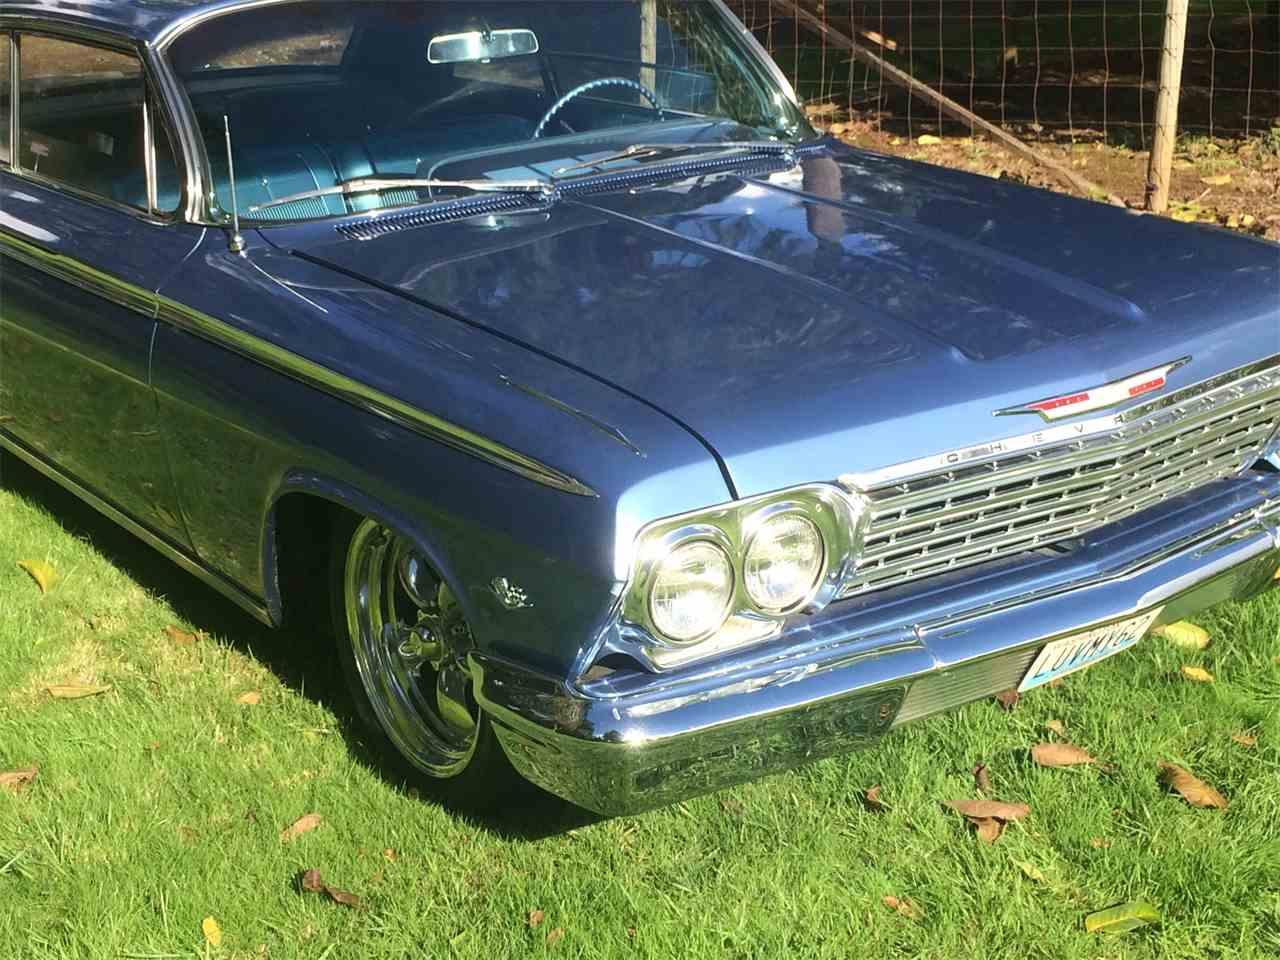 Large Picture of '62 Impala located in Centralia Washington - $33,500.00 - M85I